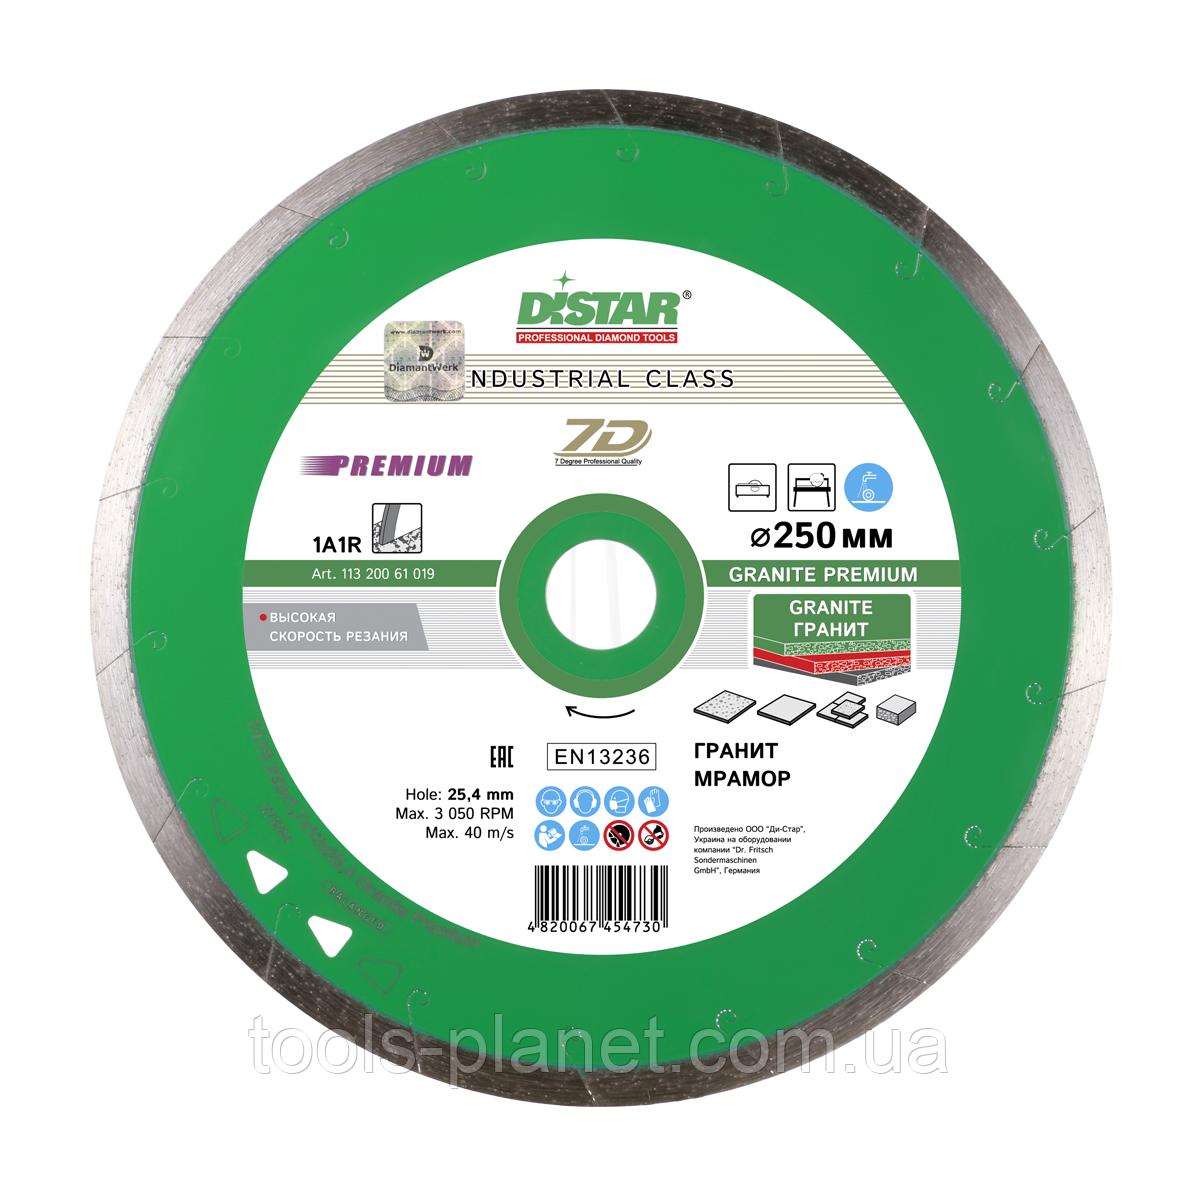 Алмазный диск Distar 1A1R 250 x 1,7 x 10 x 25,4 Granite Premium 7D (11320061019), фото 1